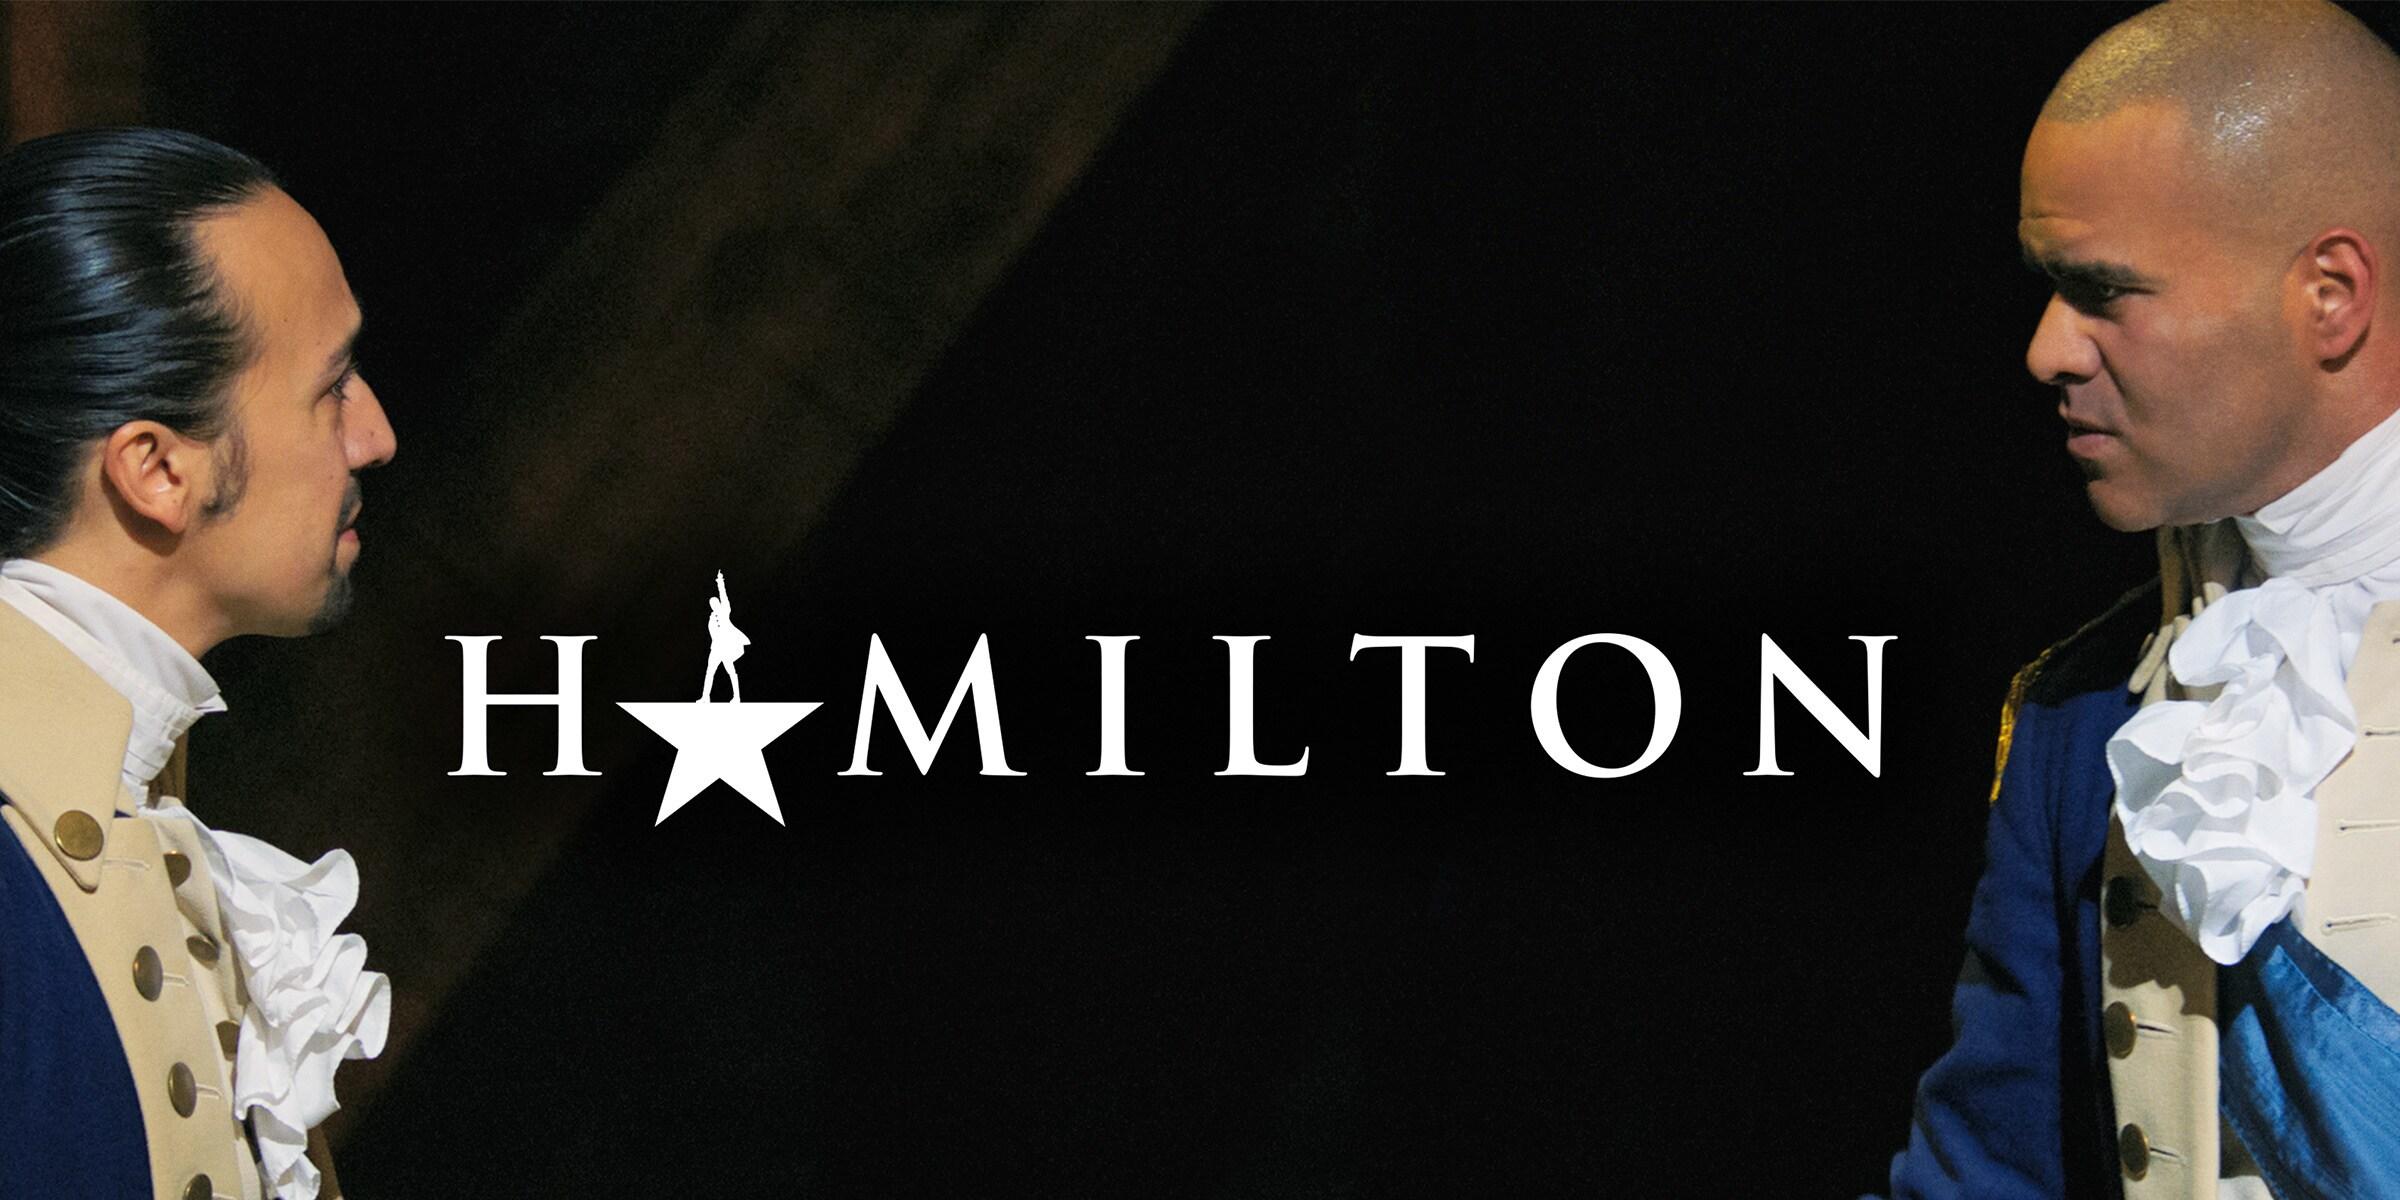 Hamilton is now streaming on Disney+